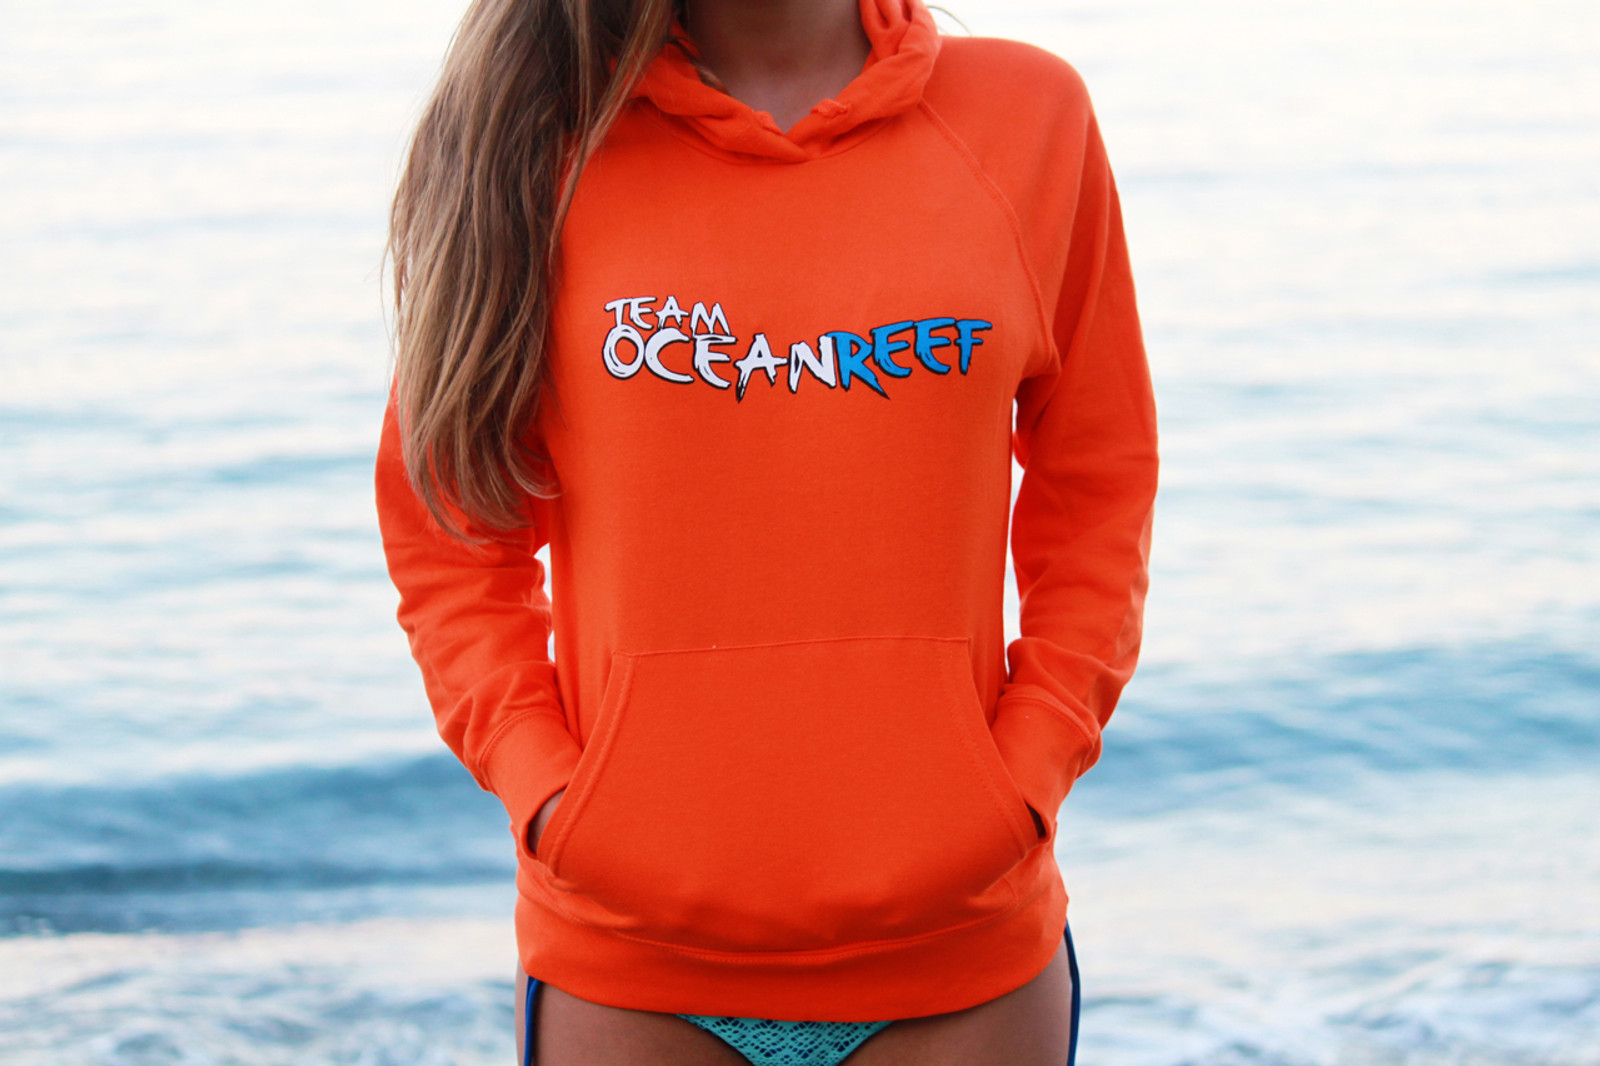 WOMEN'S ORANGE TEAM OCEANREEF SWEATER